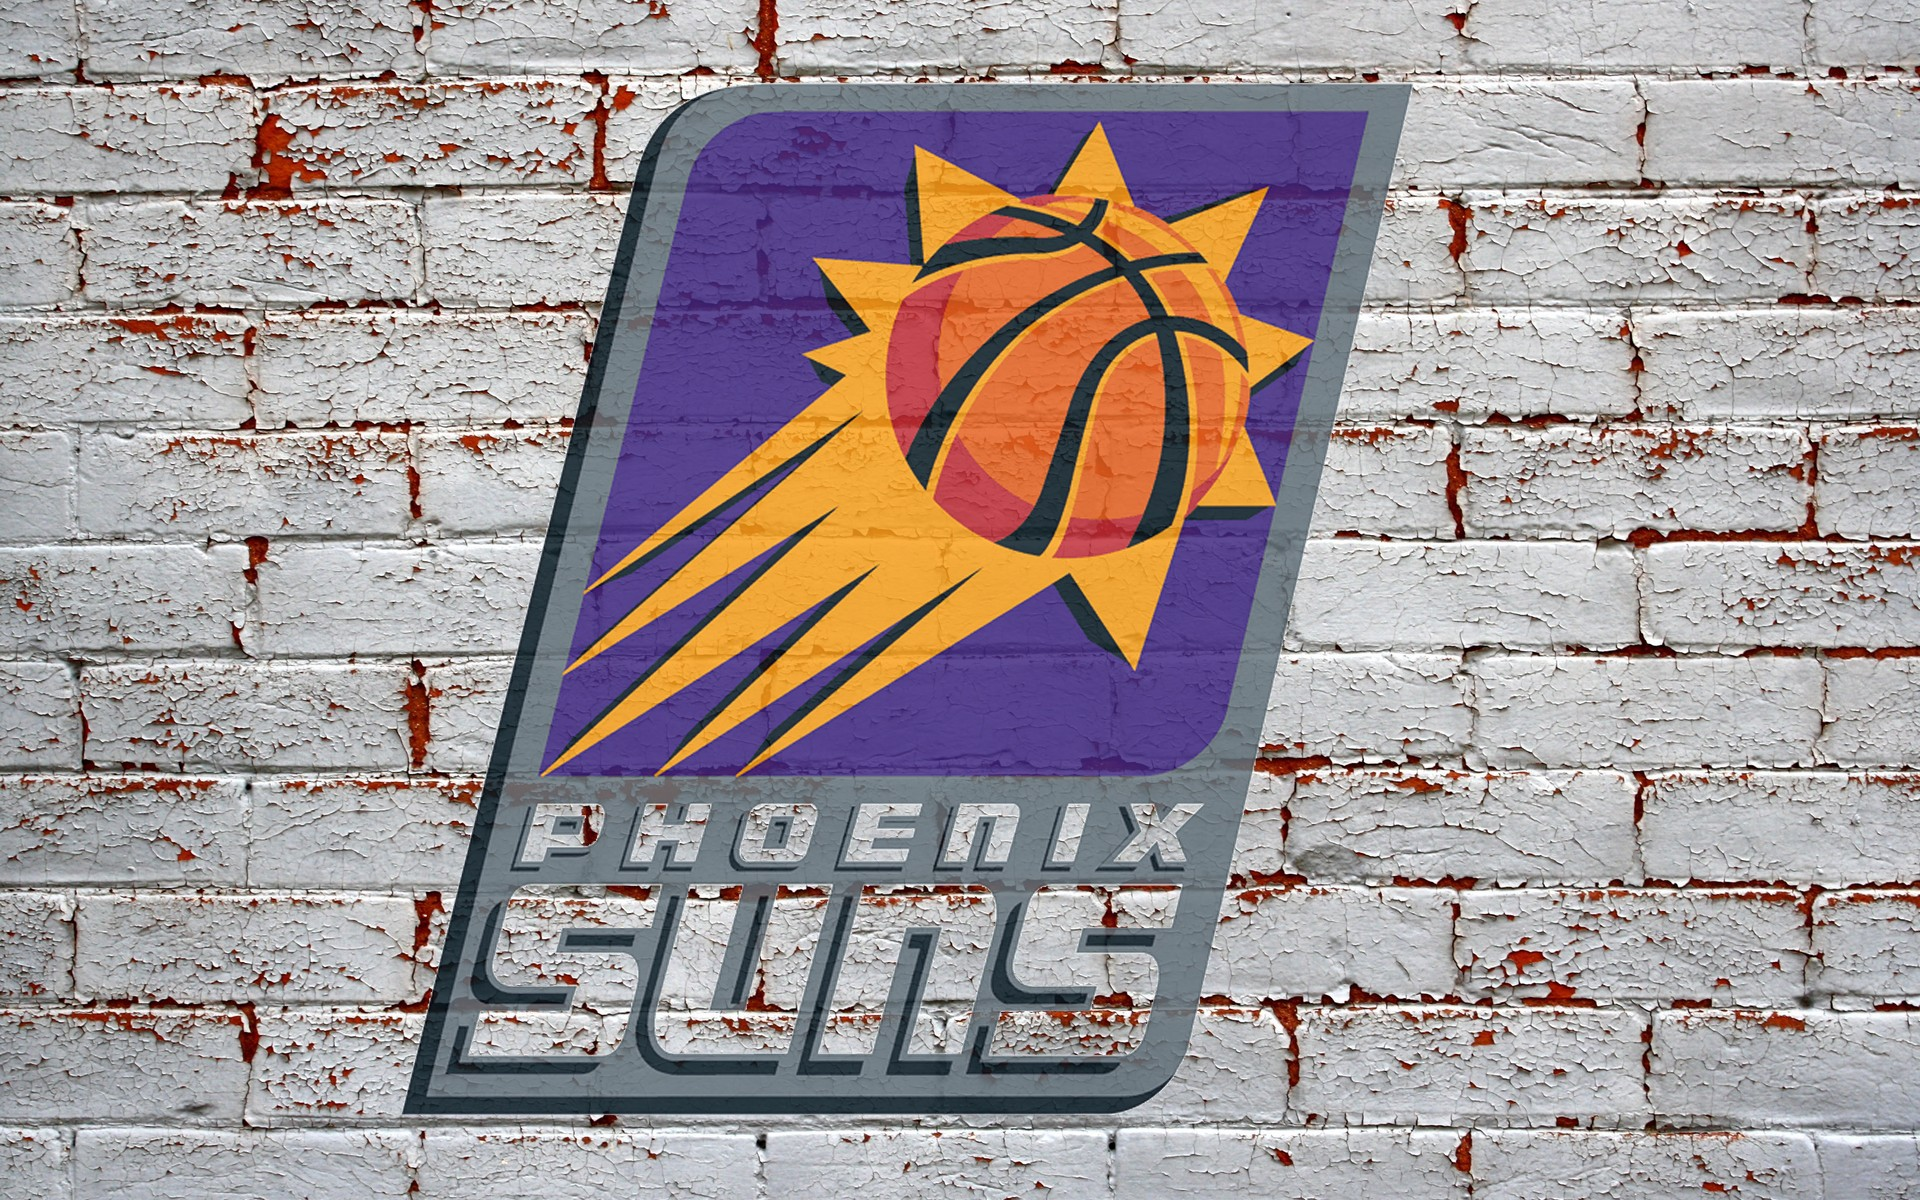 sportshdwallpaperscomdownloadphoenix suns logo on brick wall 1920x1200